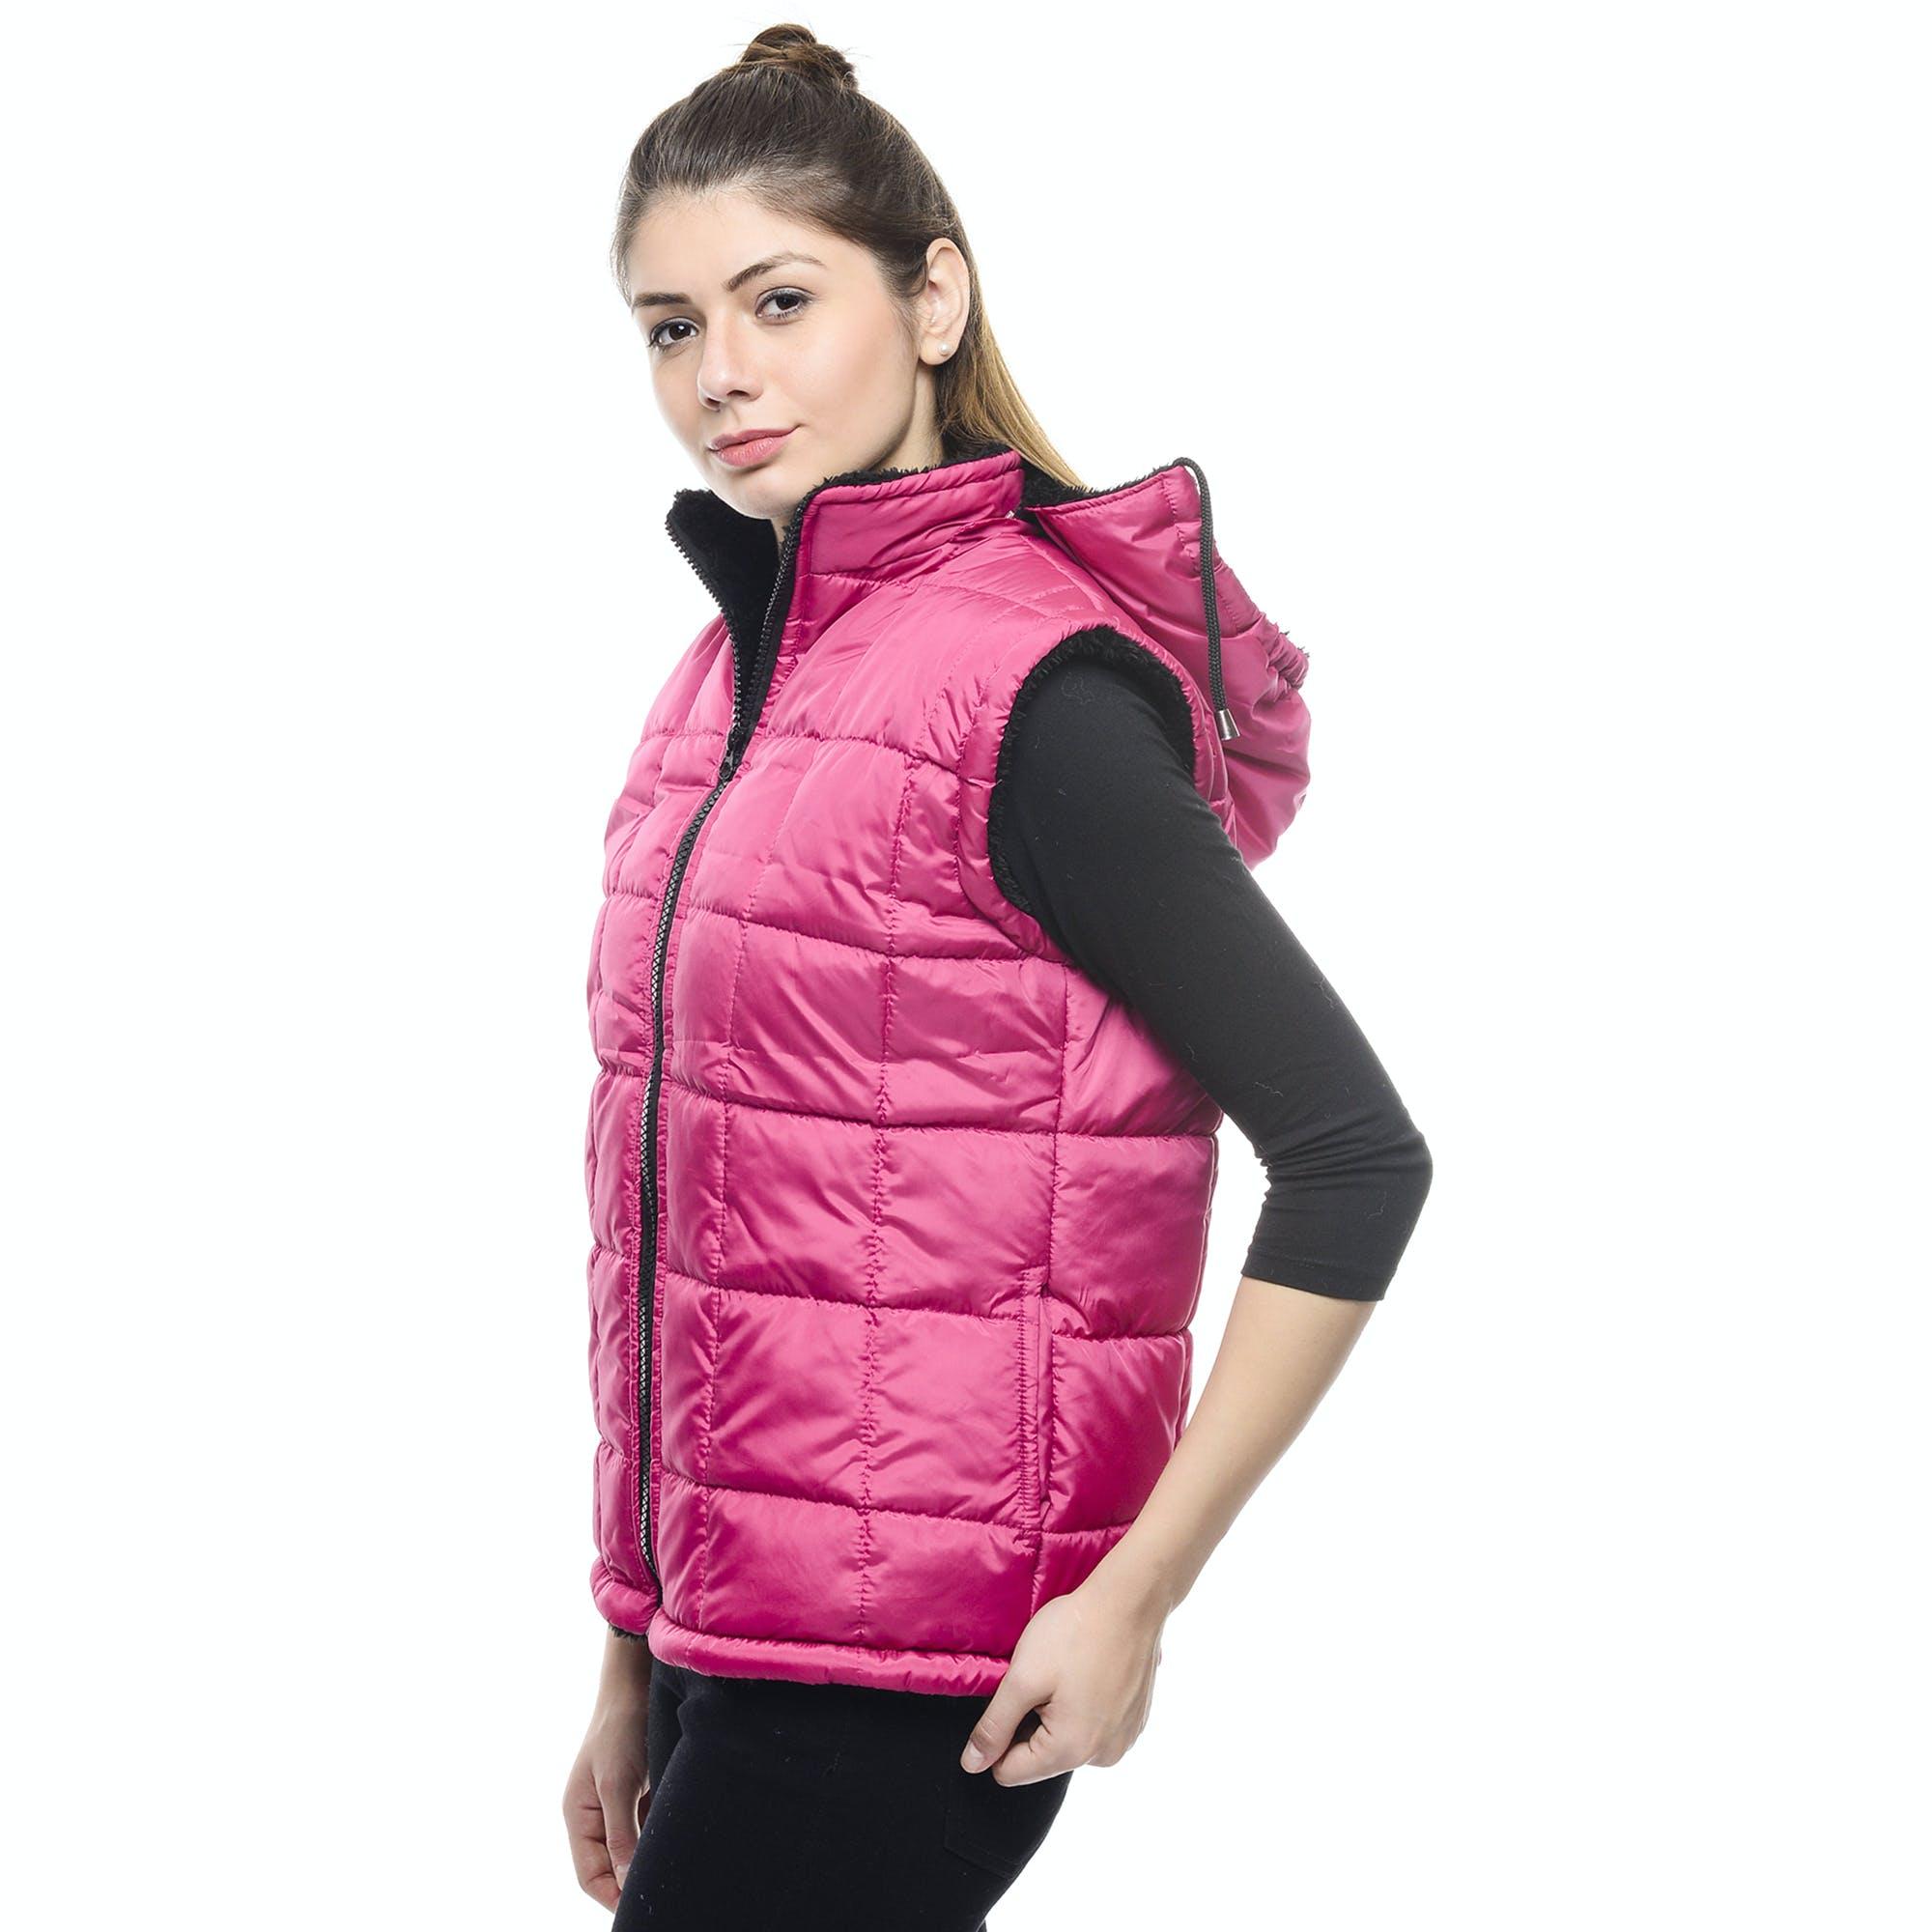 Girl Posing Wearing Puffer Vest